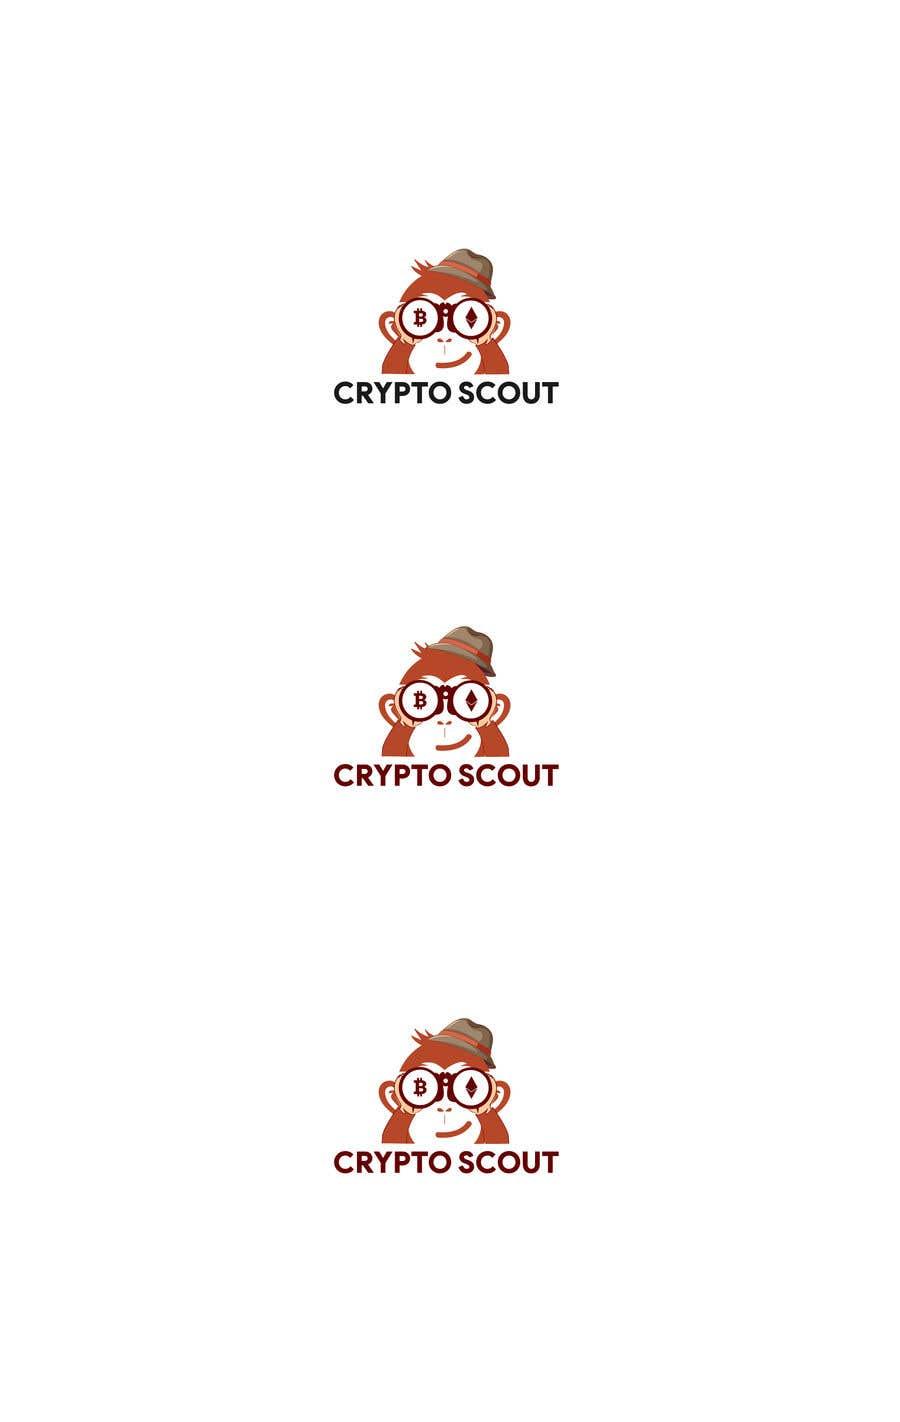 Bài tham dự cuộc thi #                                        17                                      cho                                         Design a Logo for Crypto Twitter Profile